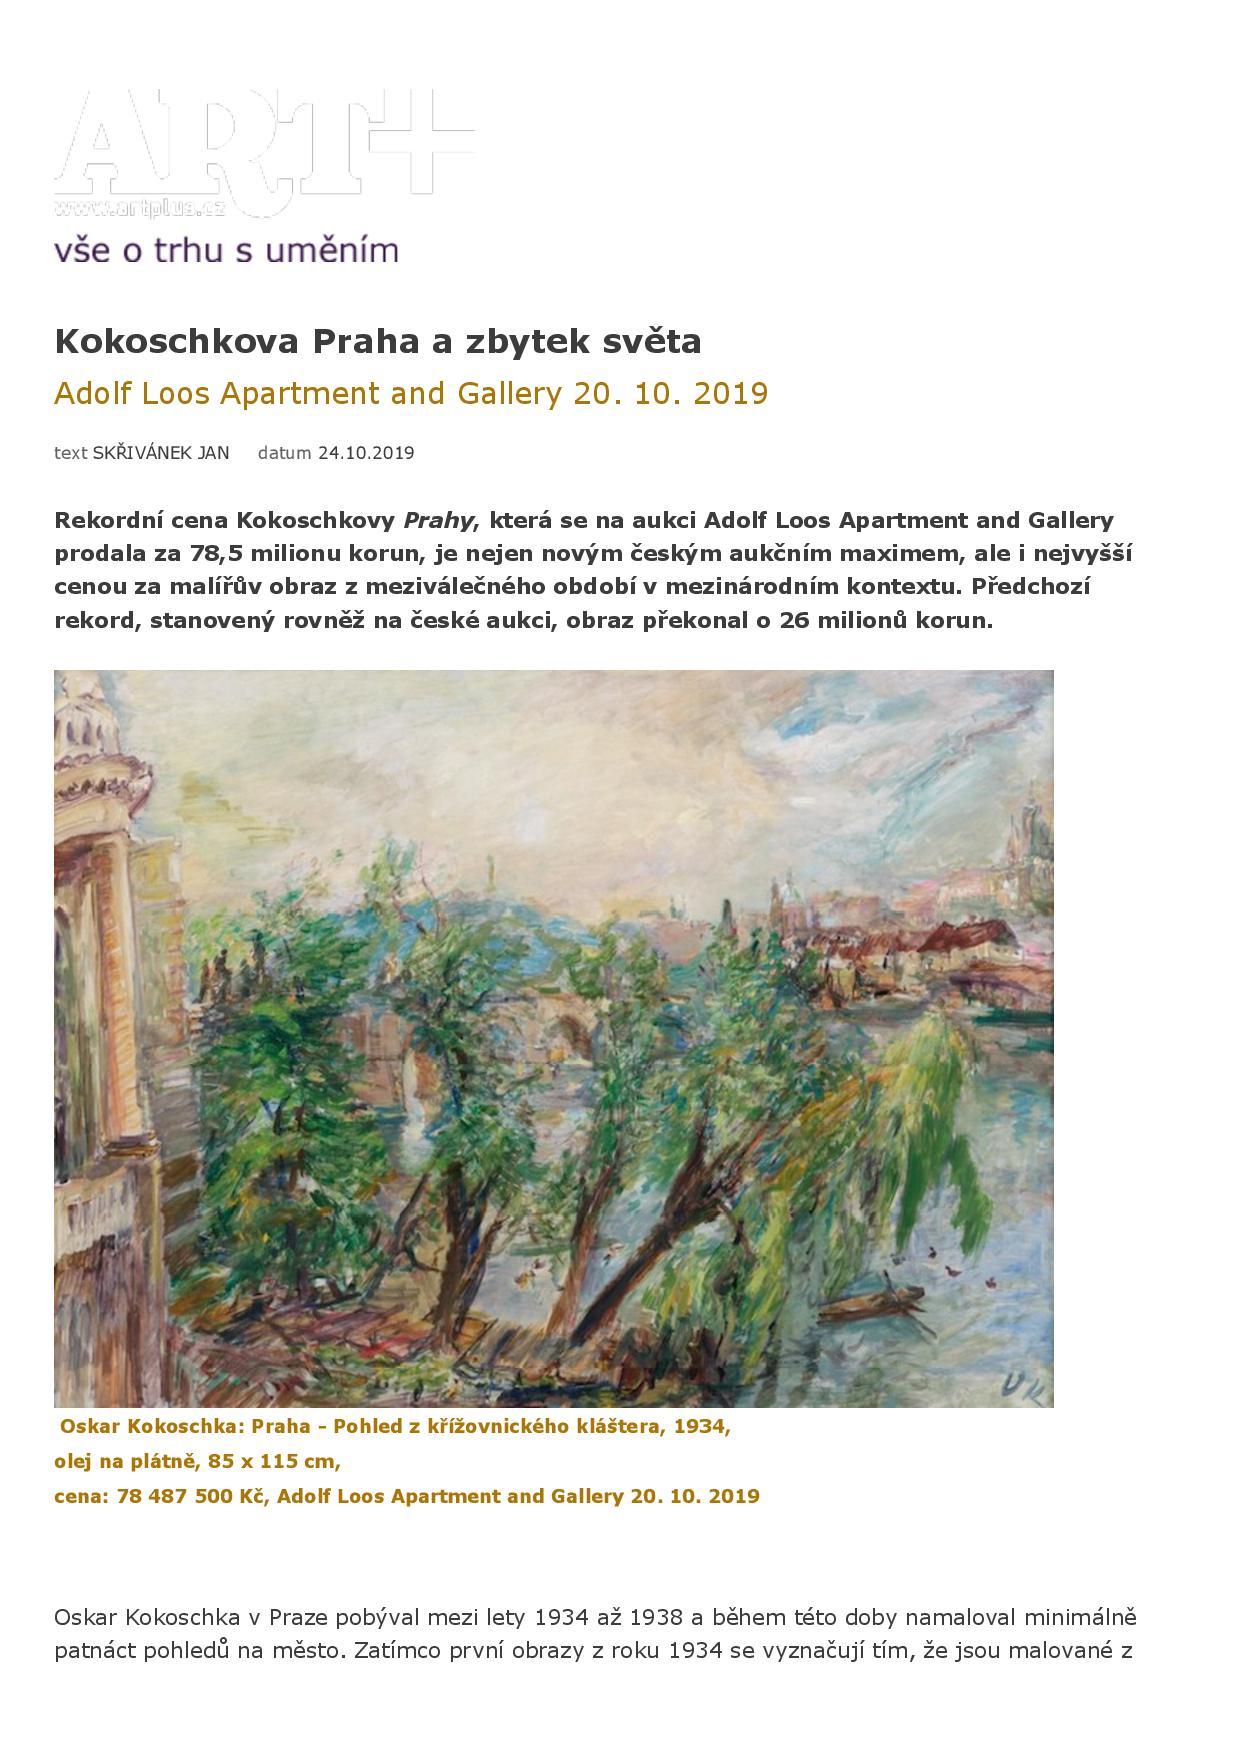 Artplus.cz, 24/10/2019, 1/6